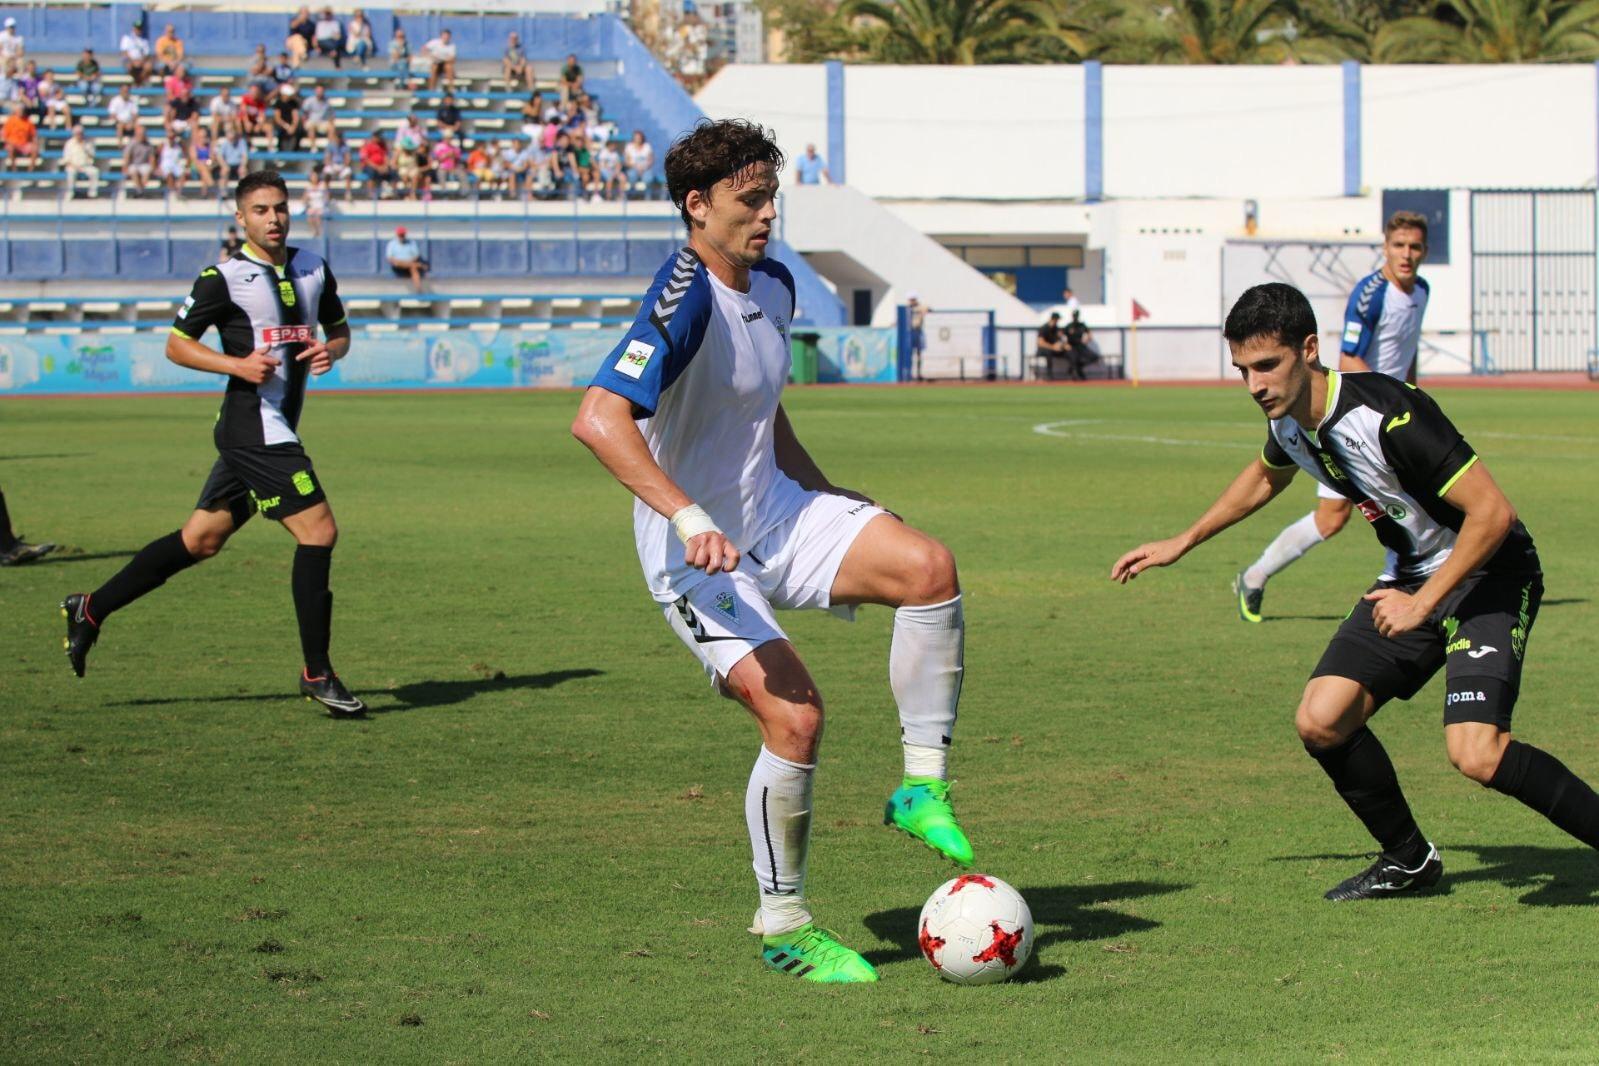 Marbella FC vs Cartagena